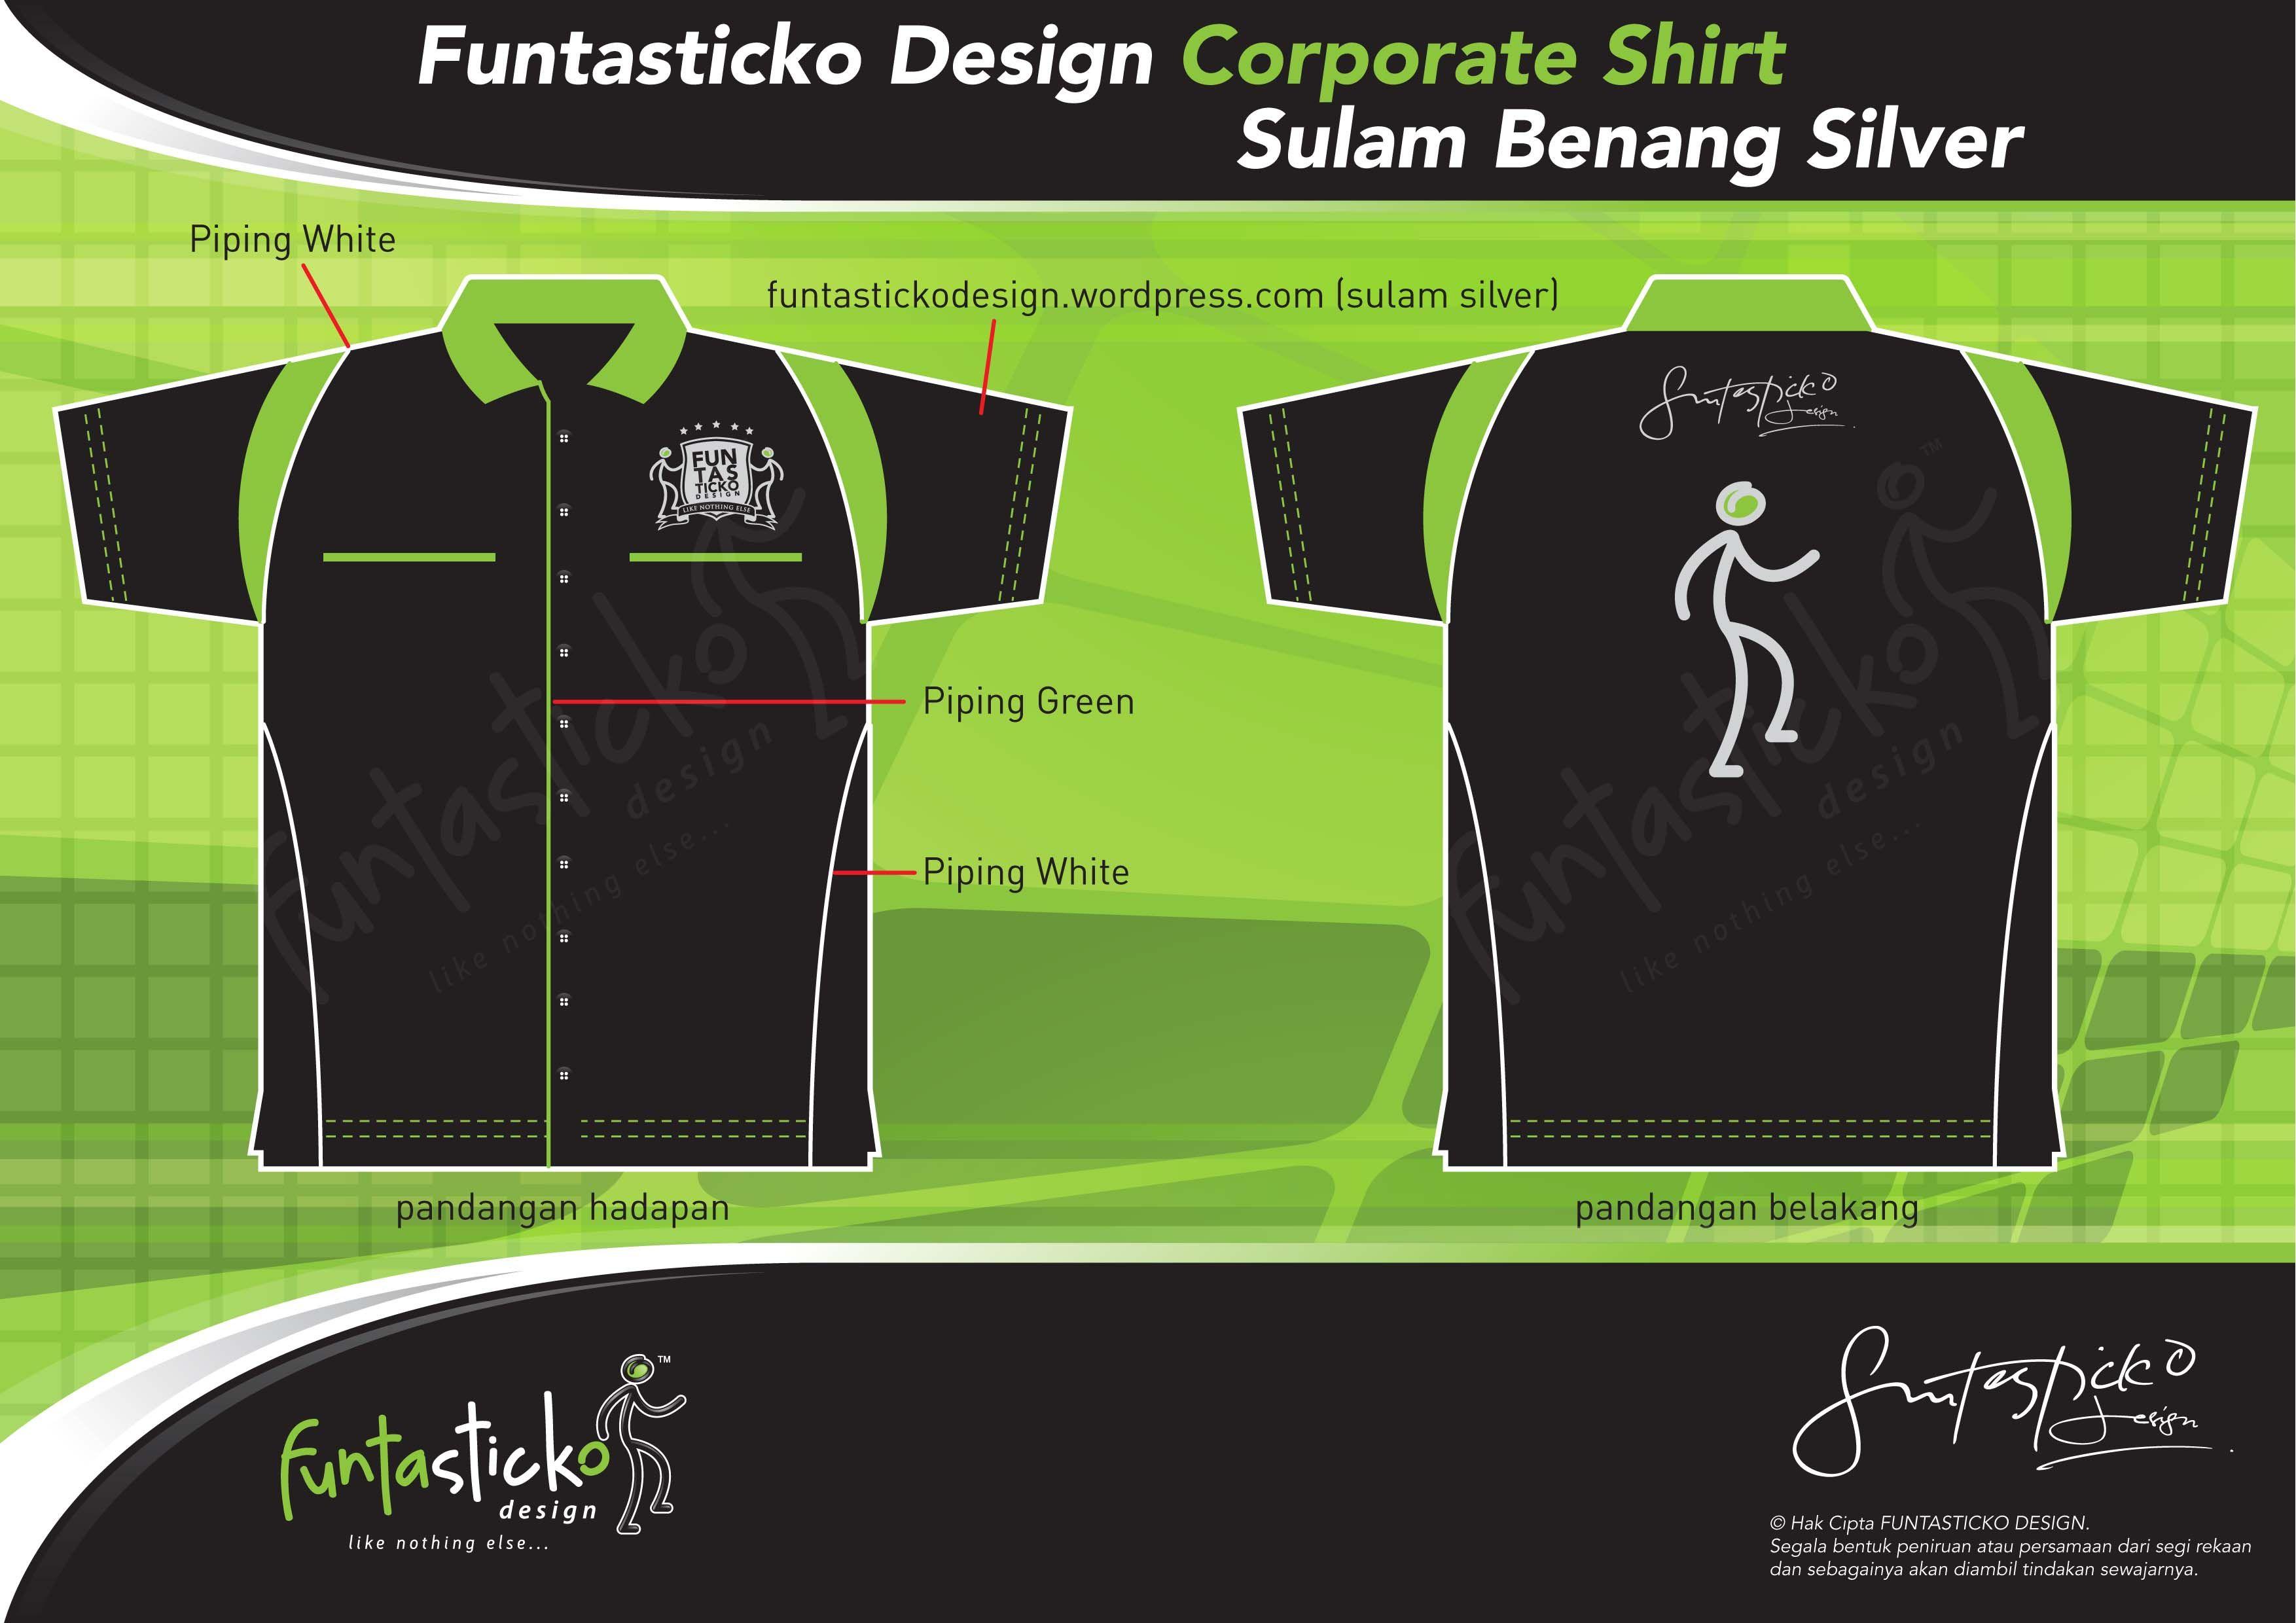 Shirt design green - Funtasticko Design Corporate Eocm F1 Shirt Design Proposal